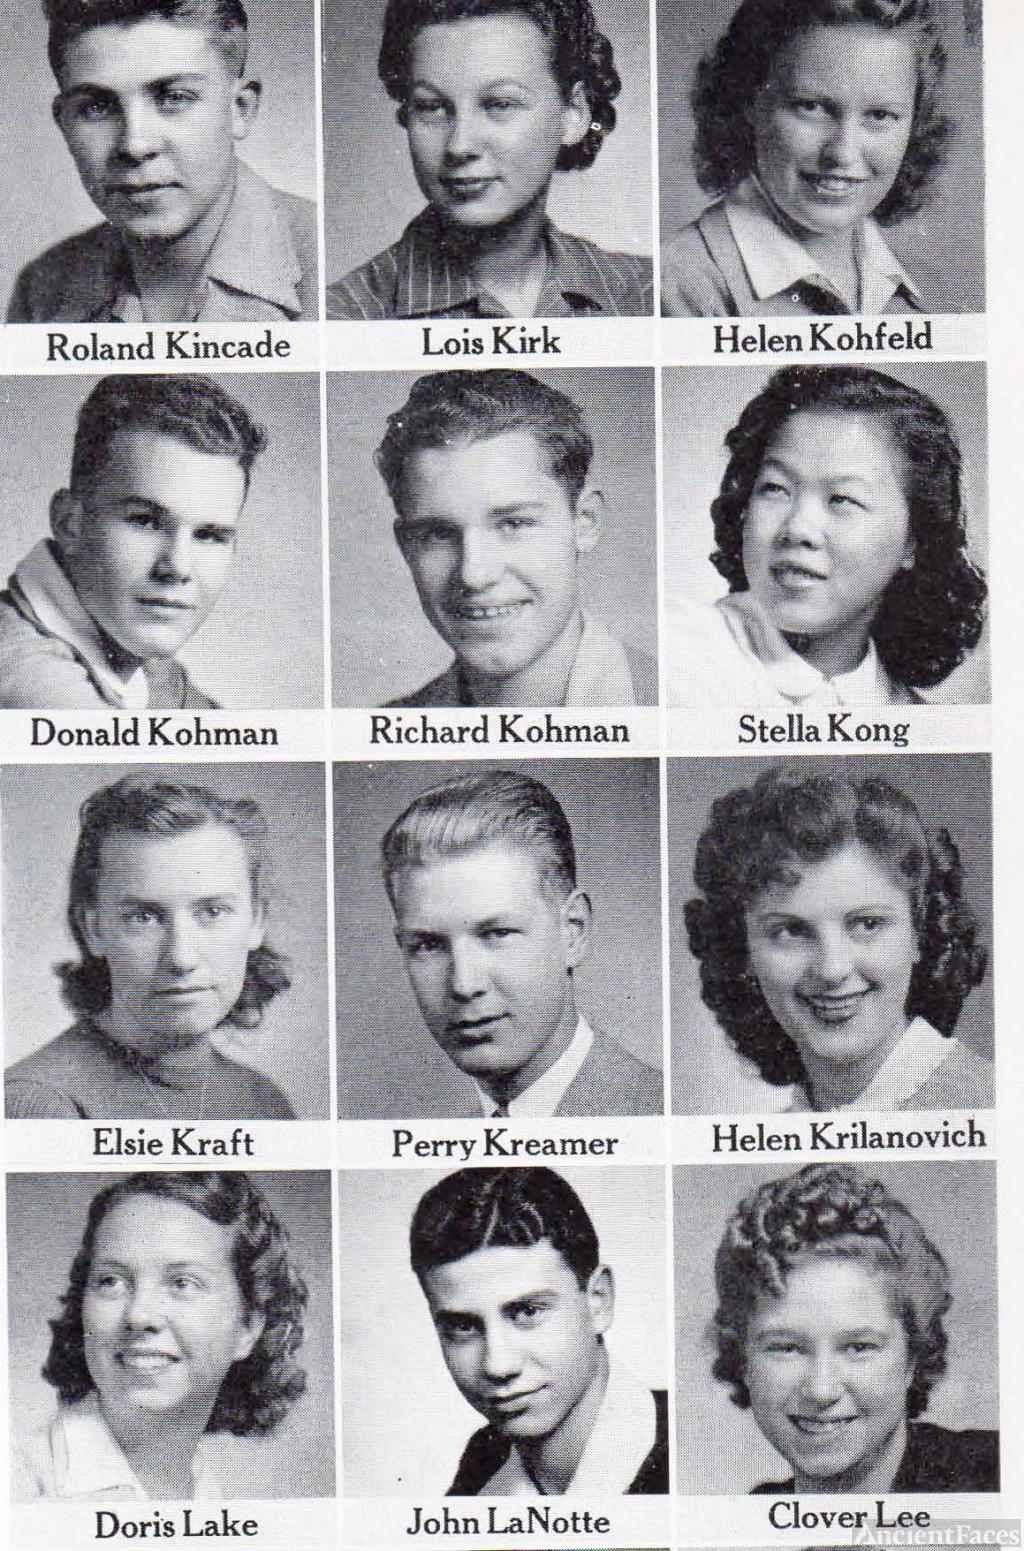 Roland Kincade, 1942 Fresno Technical High School